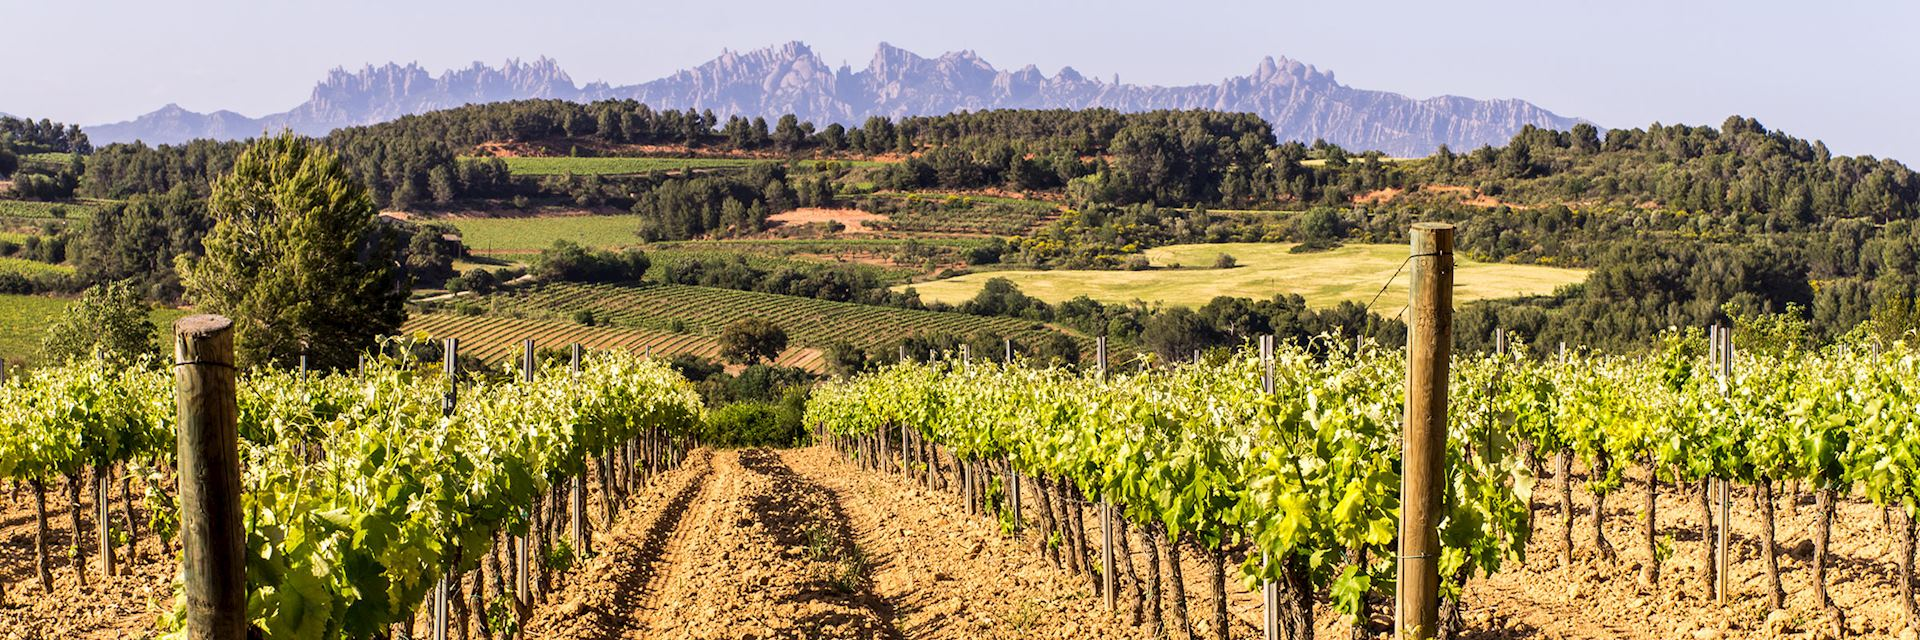 Vineyard, Montserrat, Catalonia